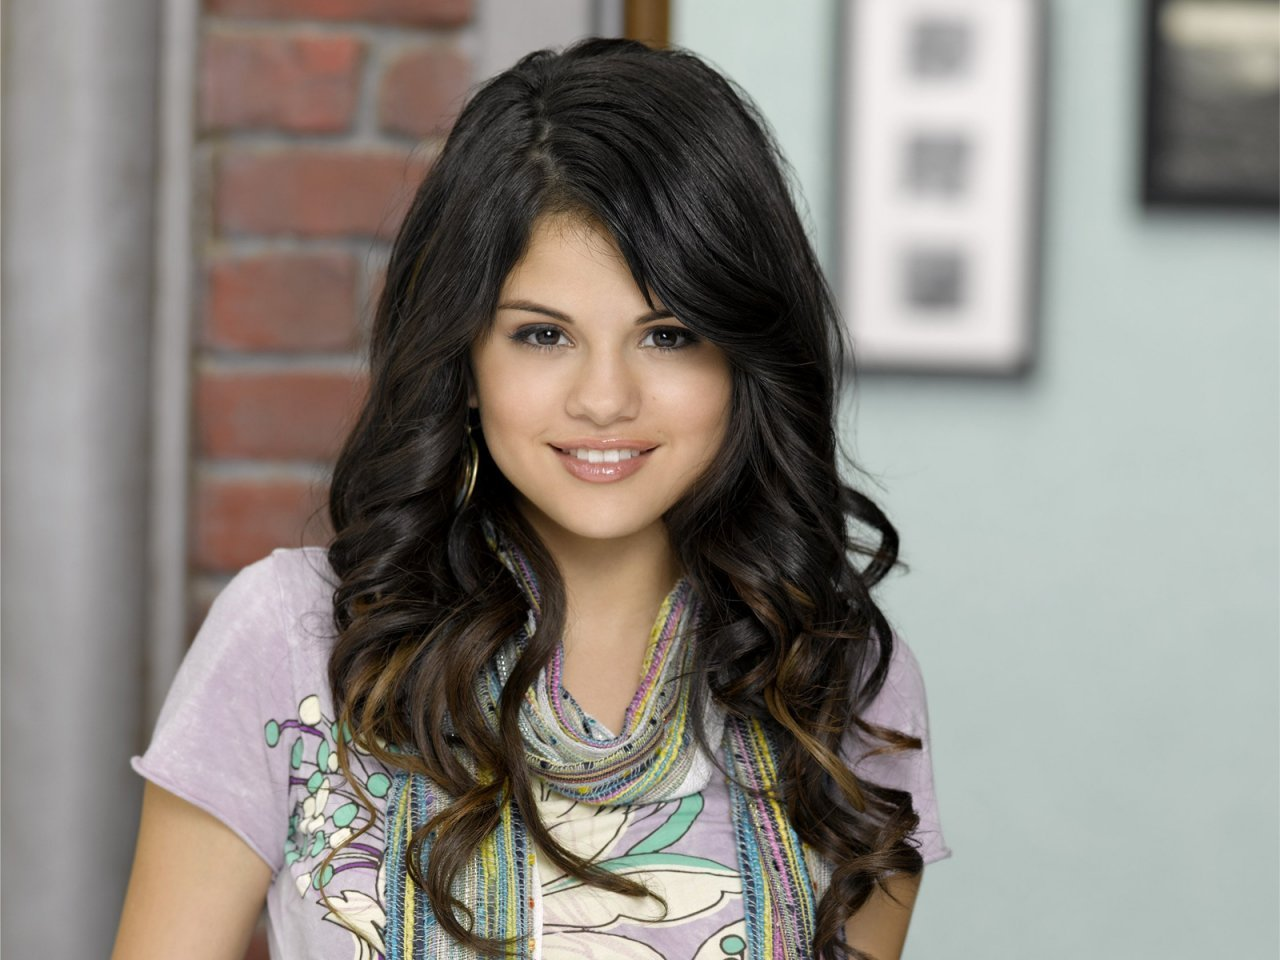 Beauty Models Images: Selena Gomez